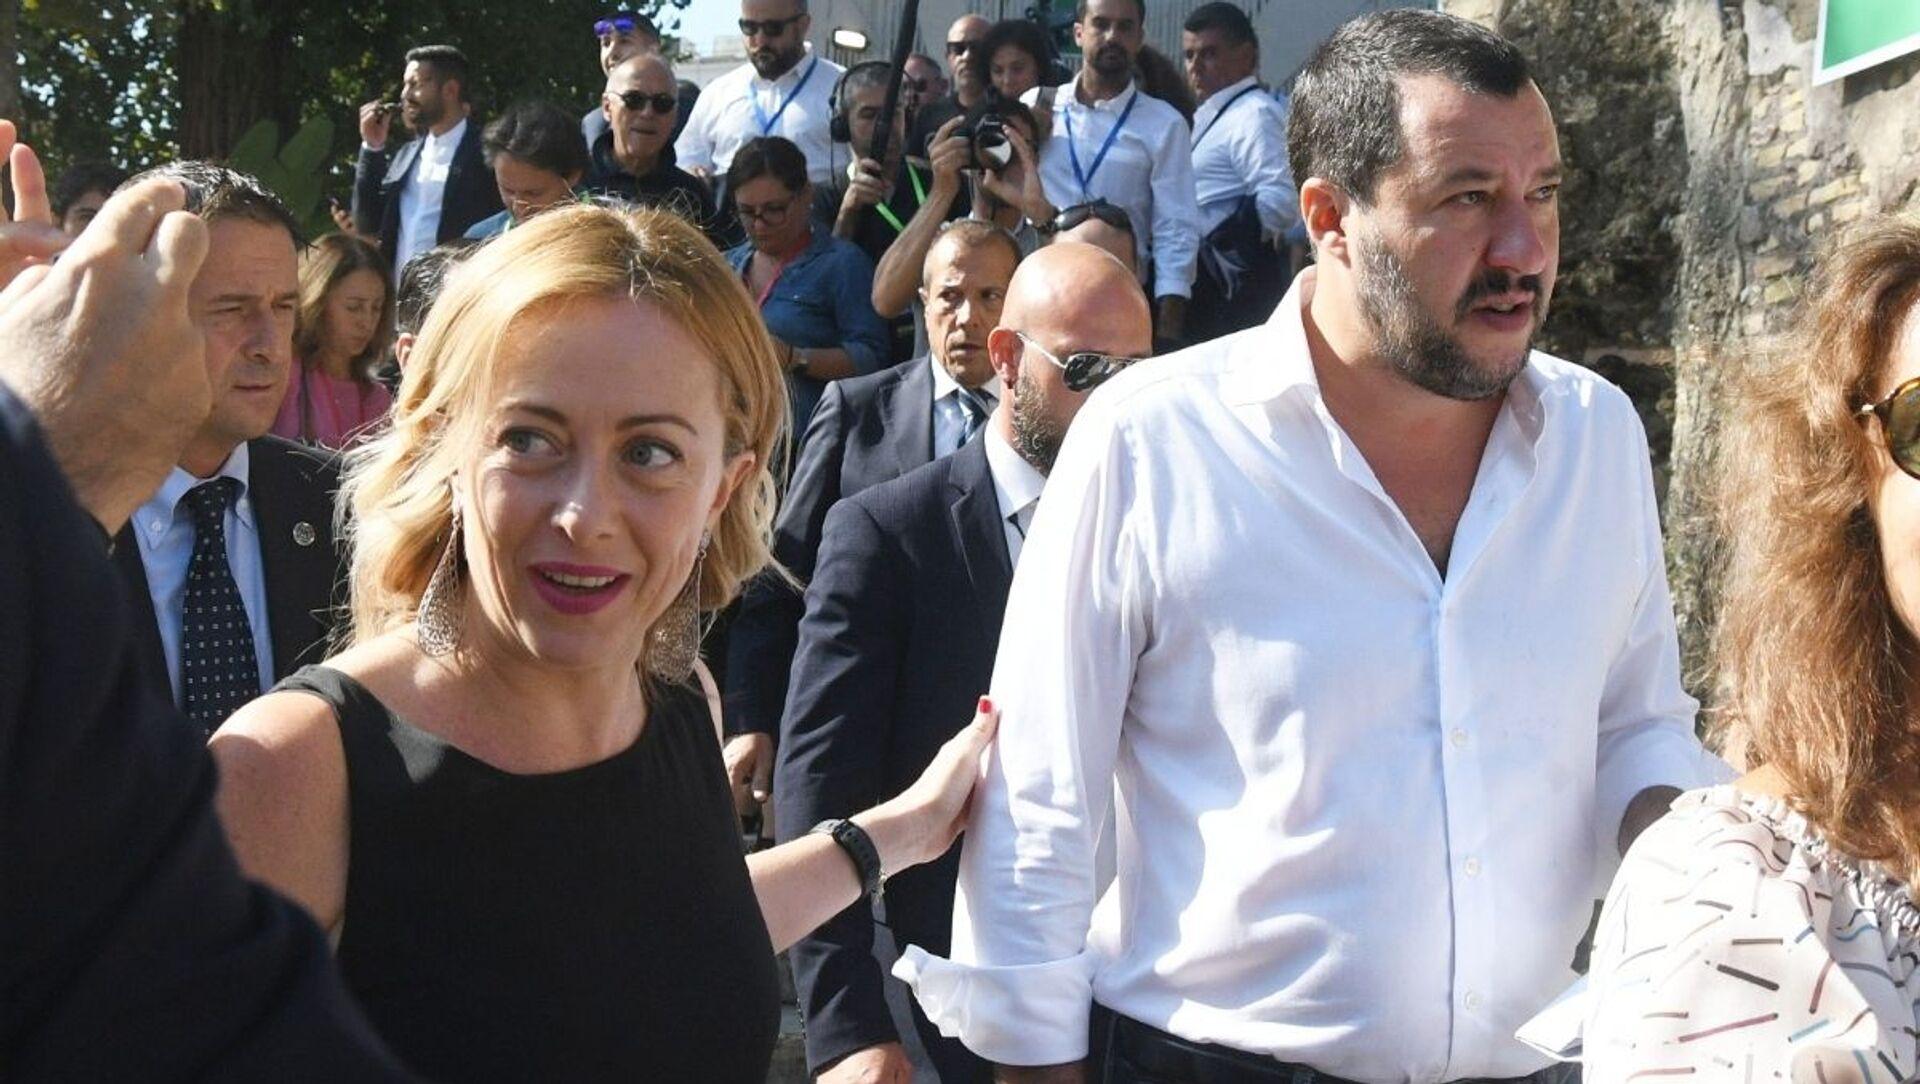 Giorgia Meloni e Matteo Salvini - Sputnik Italia, 1920, 07.05.2021